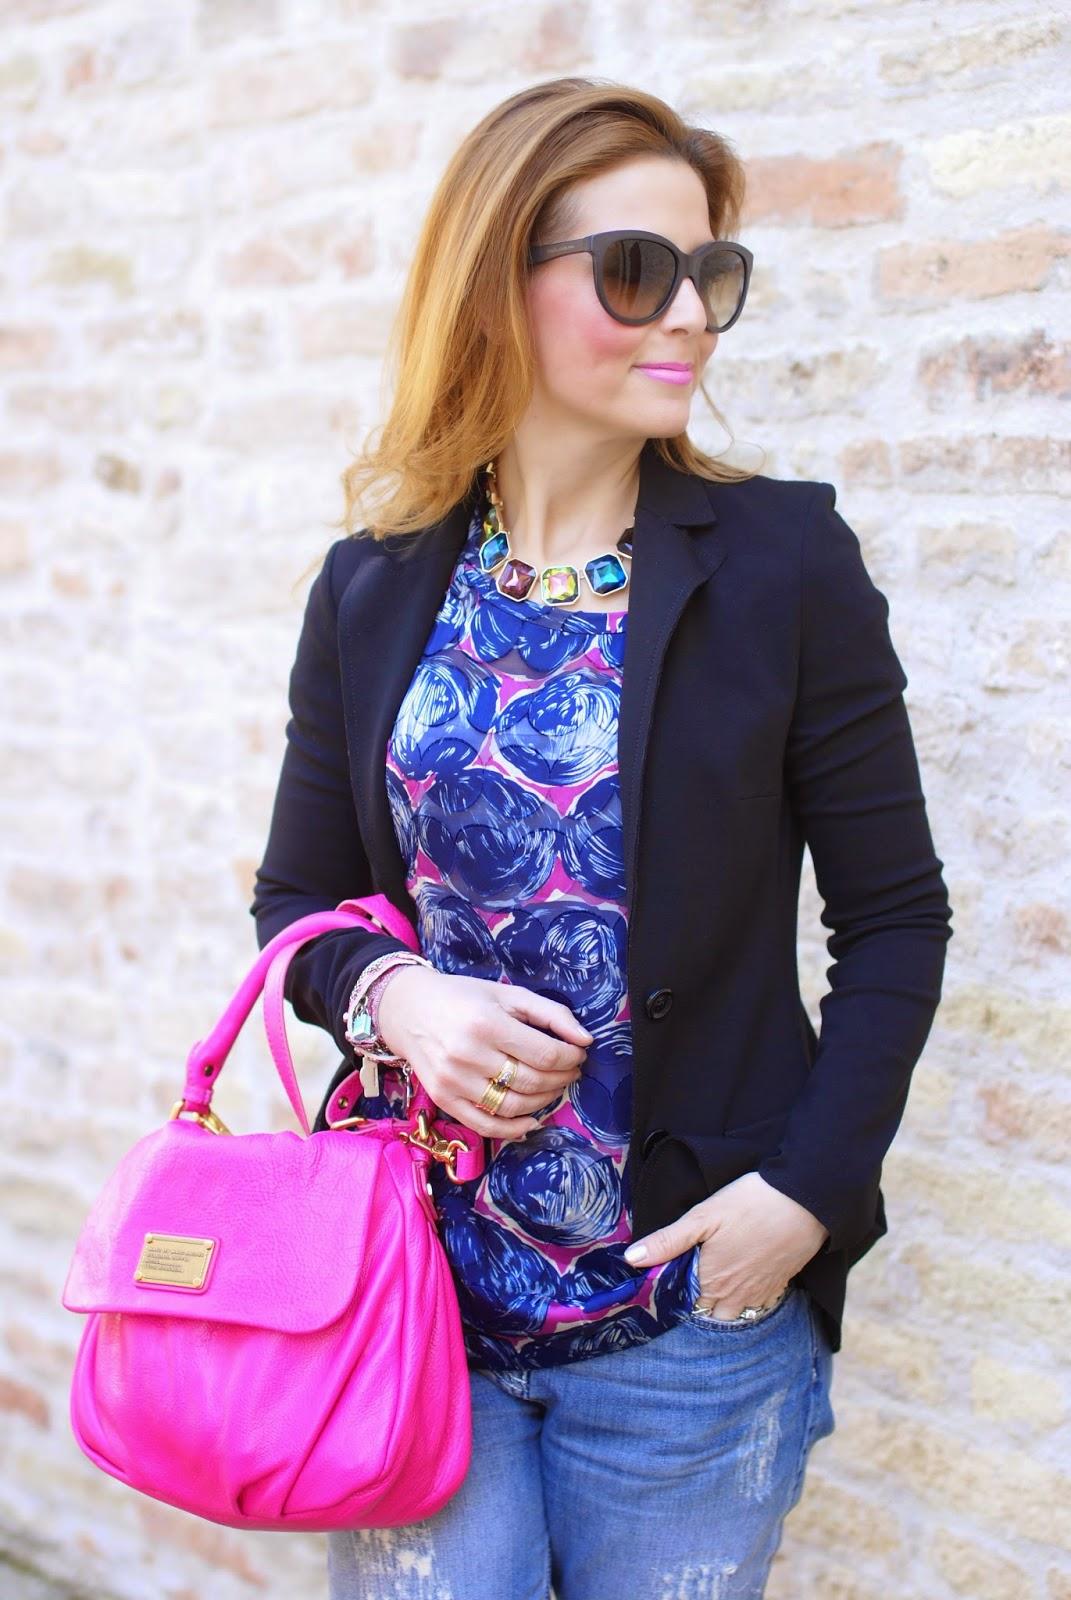 Tory Burch blouse, zara necklace and carla g blazer, fashion blog, fashion blogger style